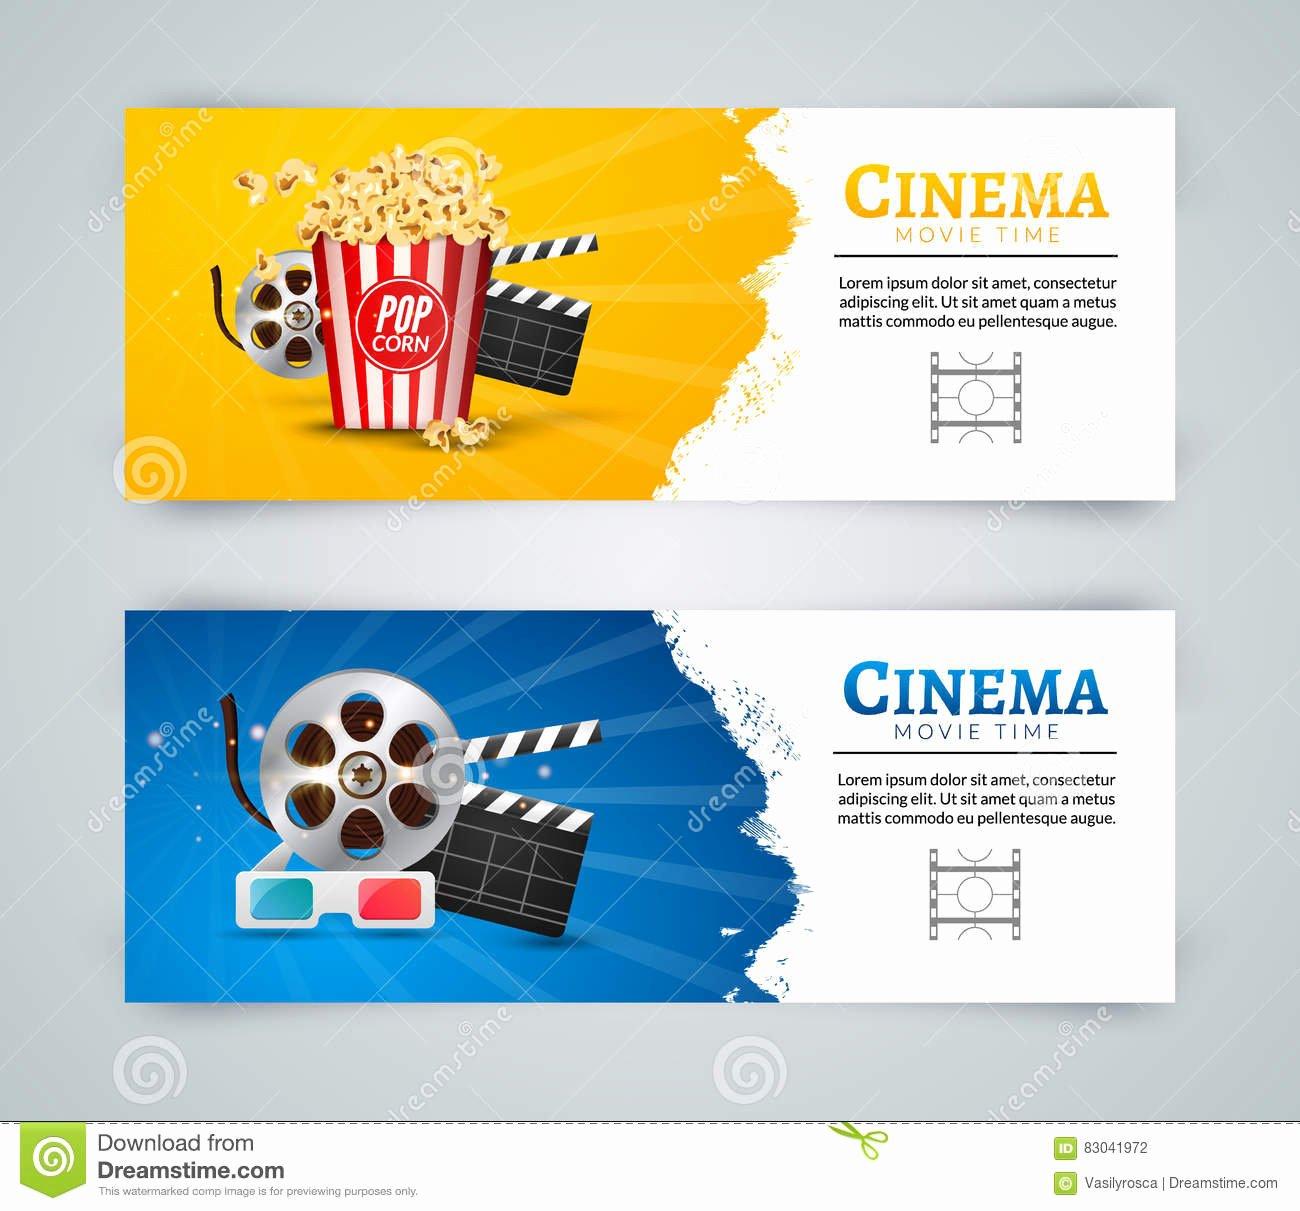 Movie Poster Design Template Inspirational Cinema Movie Banner Poster Design Template Clapper